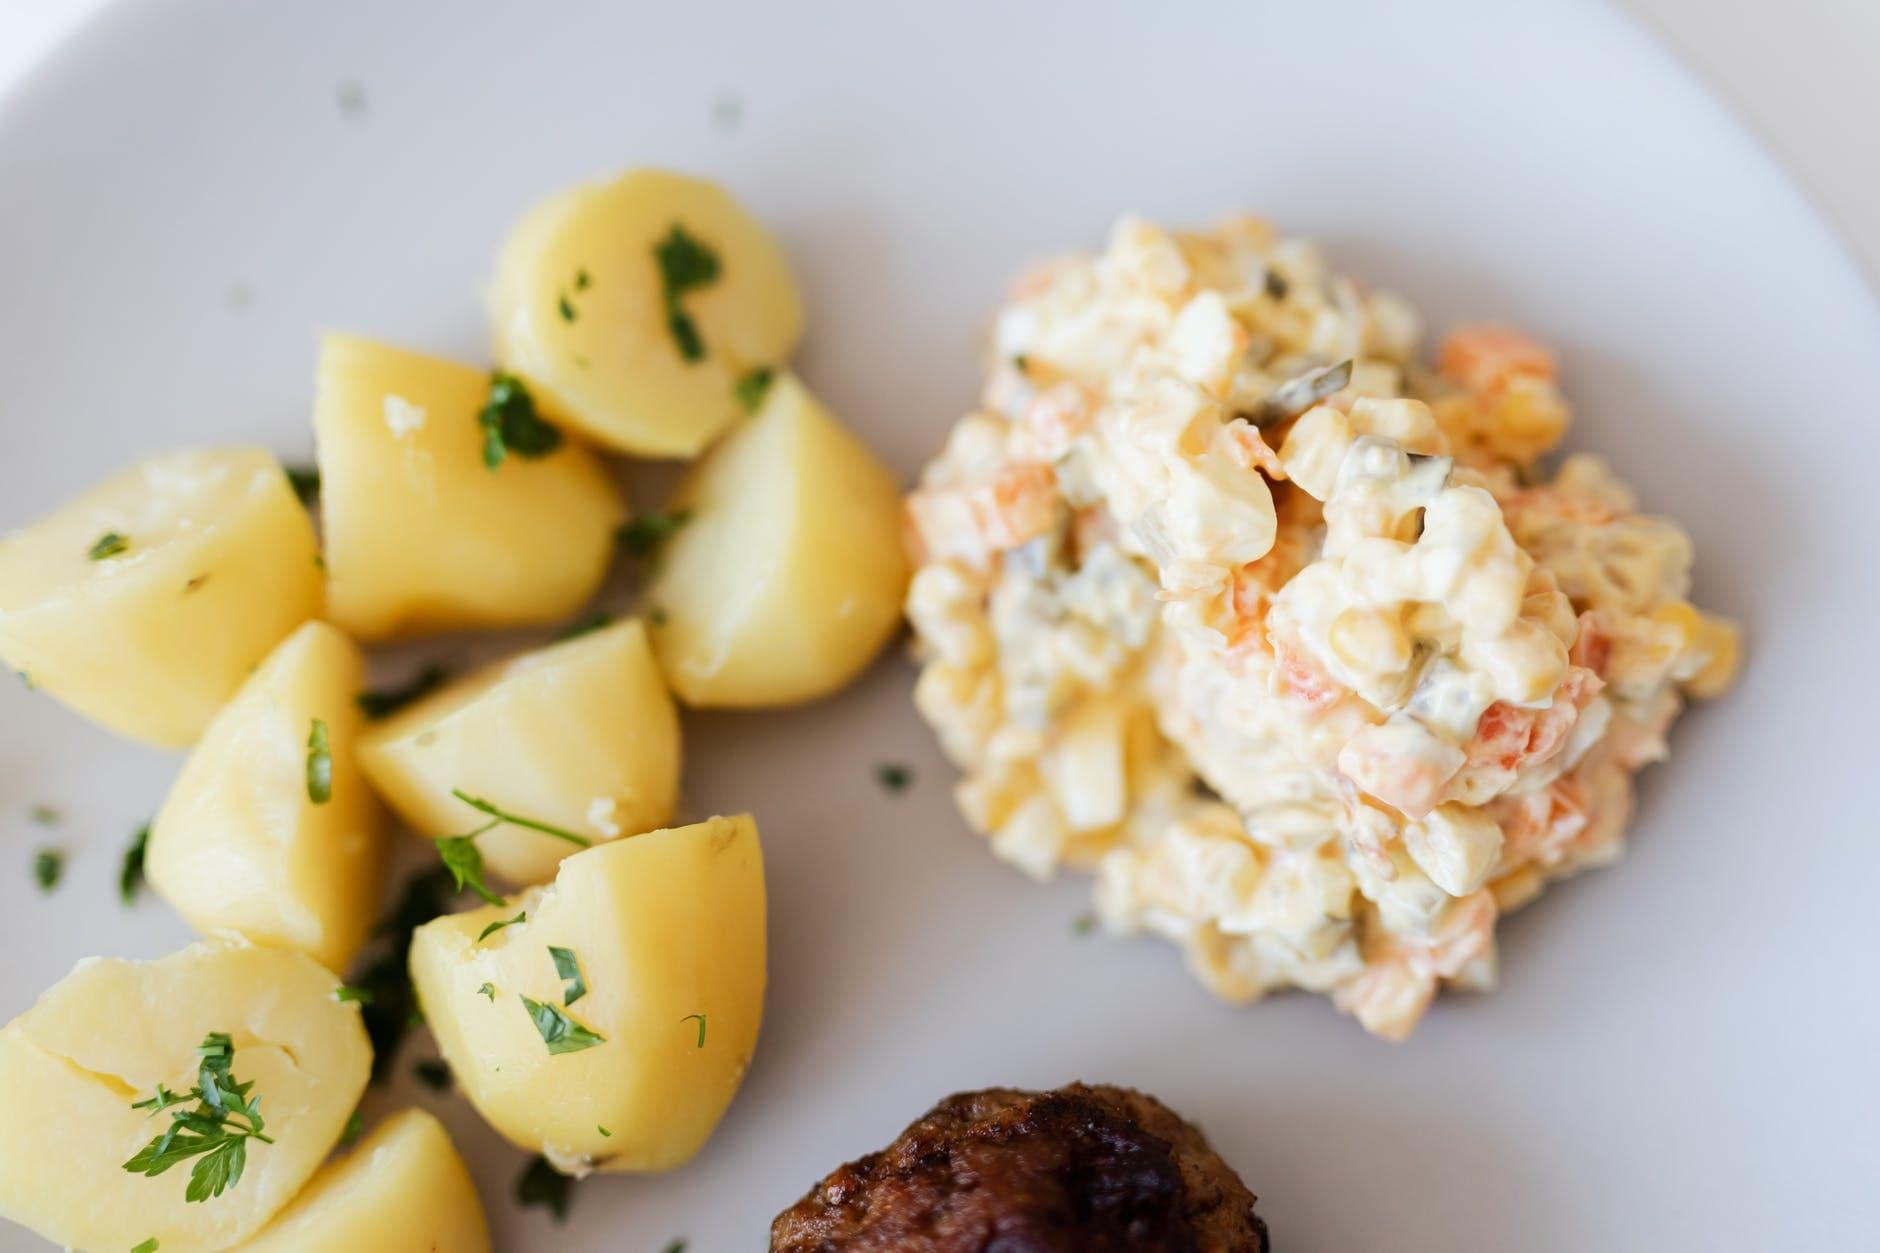 How to make sweet potato salad for men